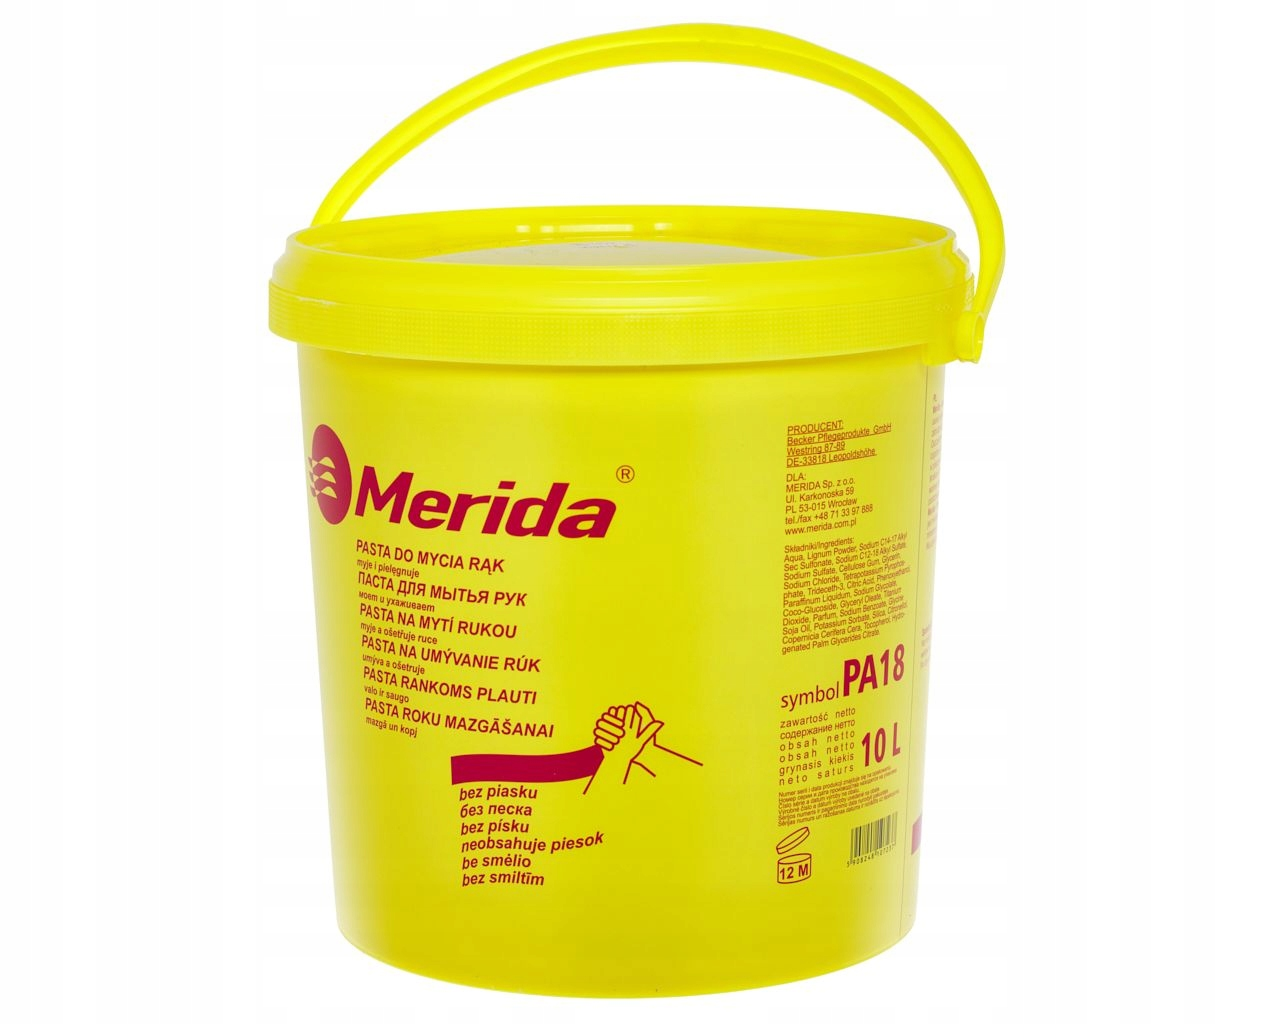 ЭФФЕКТИВНАЯ Паста для рук H&S MERIDA 10L